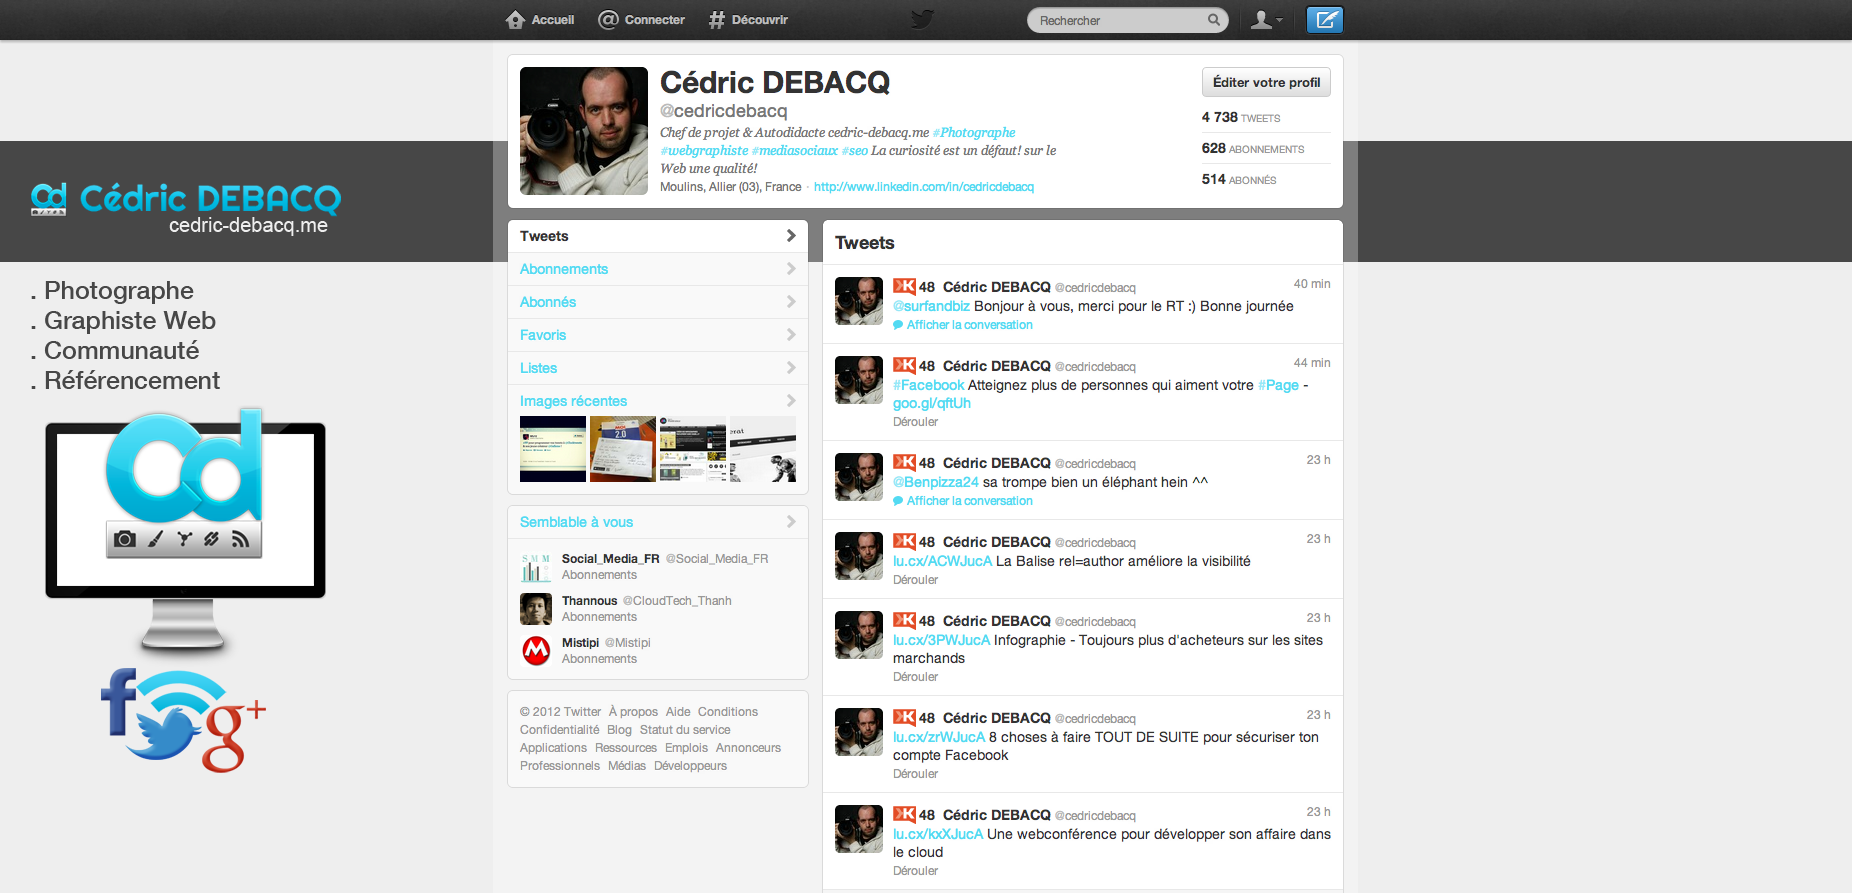 Cédric Debacq - Twitter